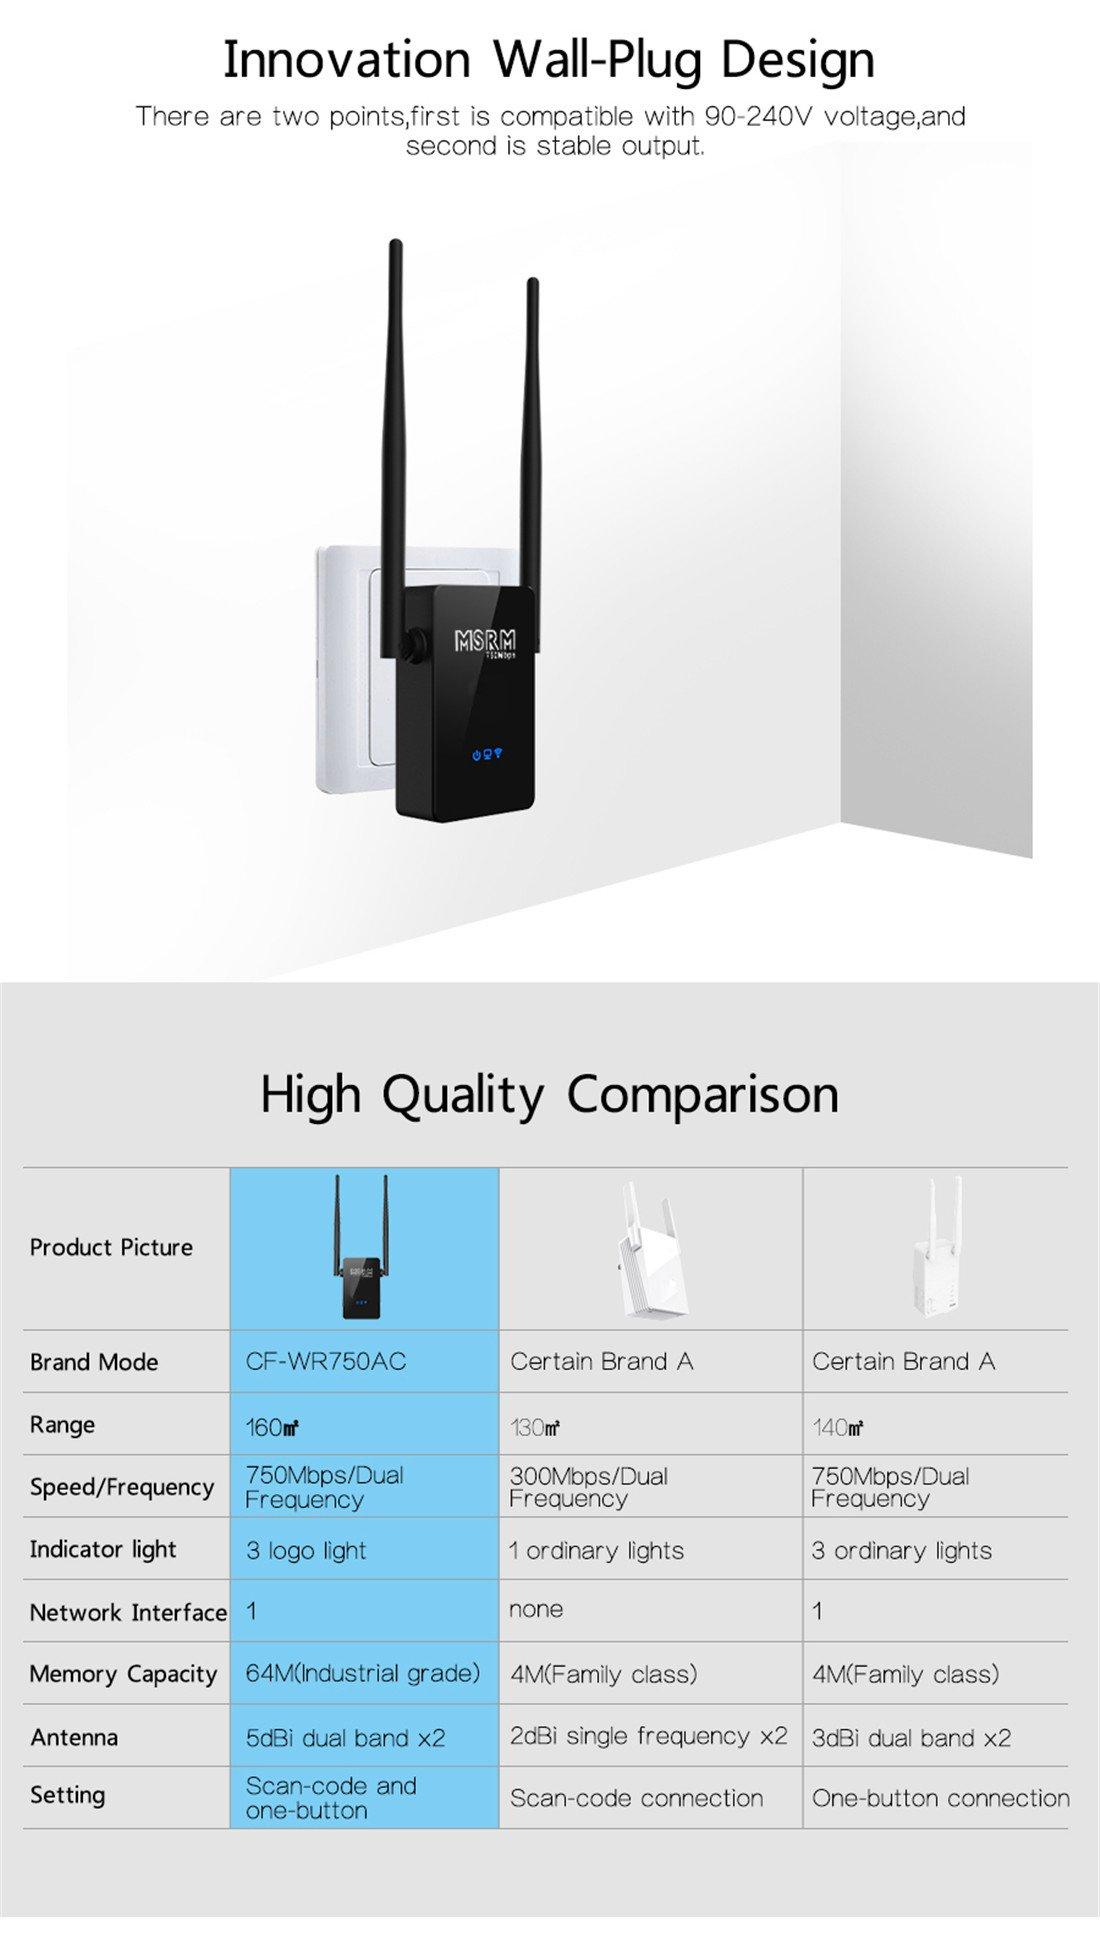 MSRM US750 750Mbps Long WiFi Range Extender 360 Degree Full Coverage High Power Dual Band Range Extender (Black) by MSRMUS (Image #6)